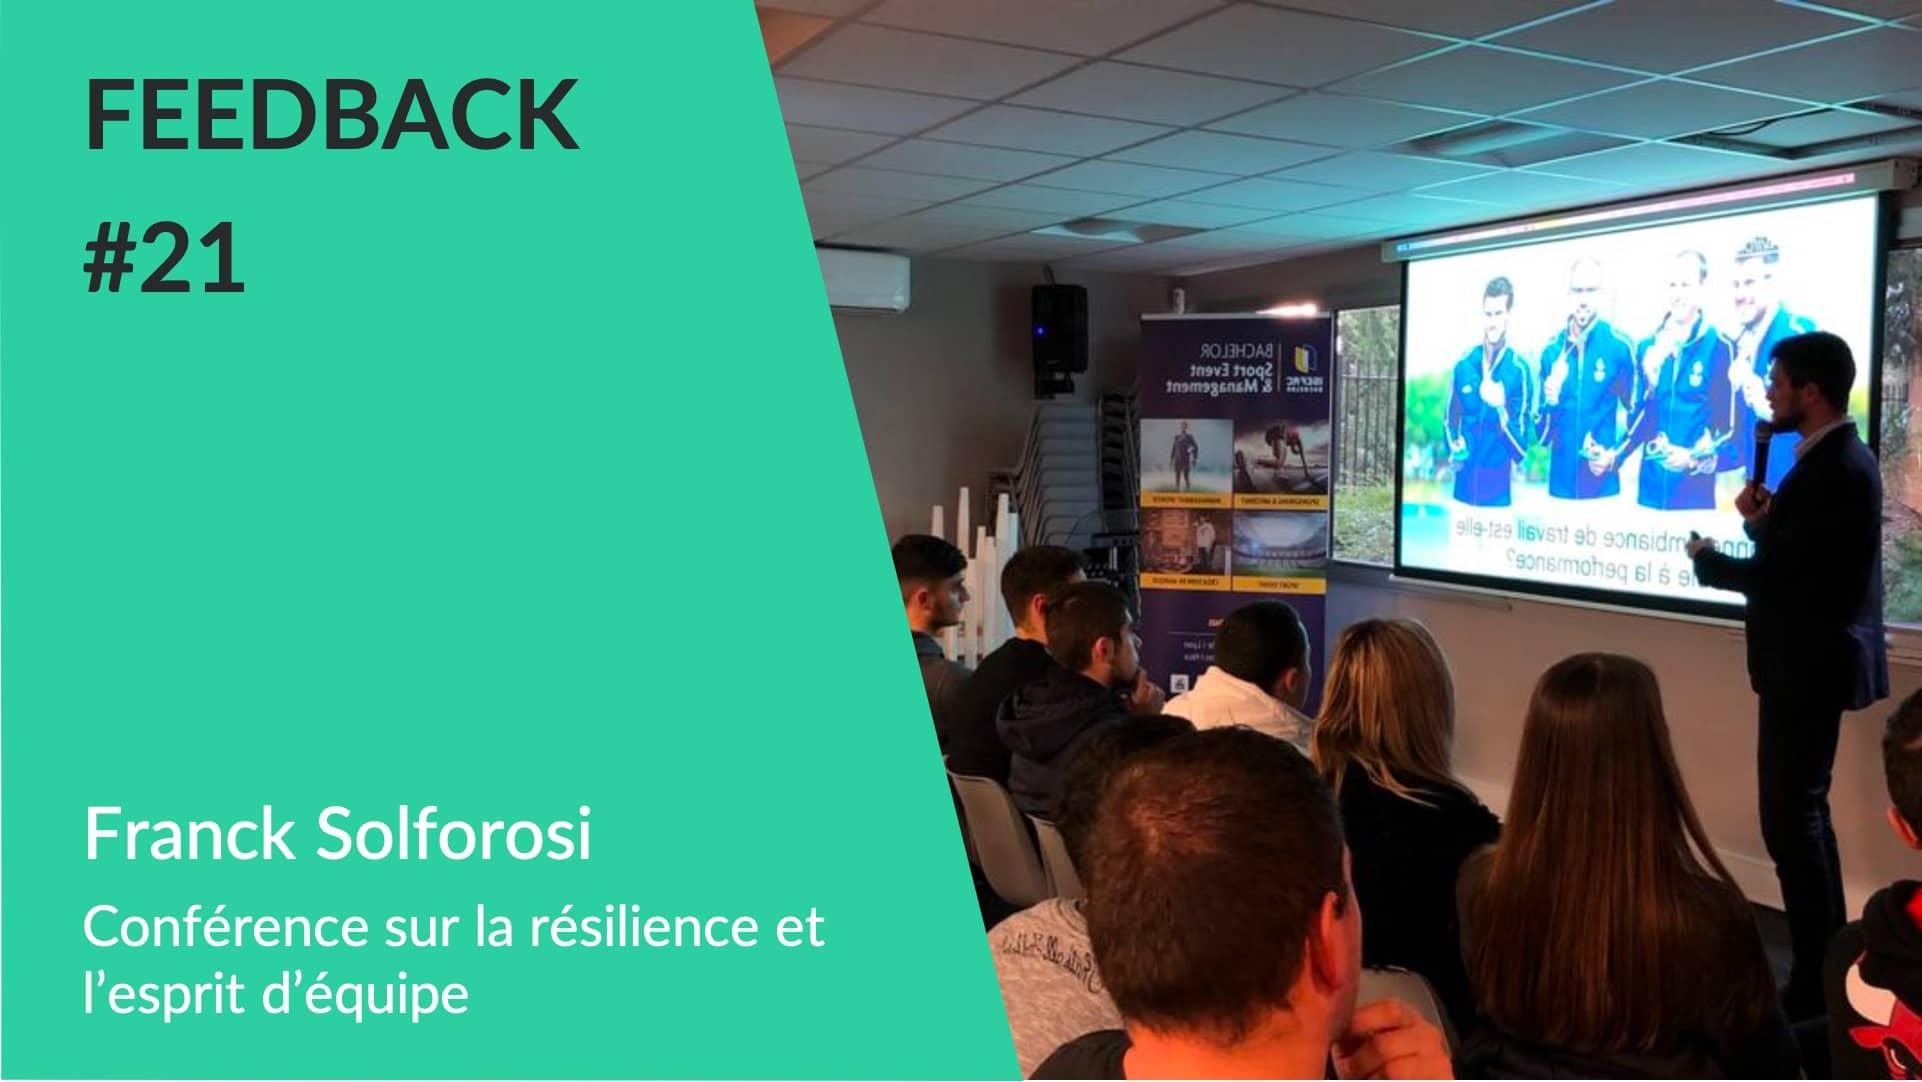 Feedback - Conférence esprit d'équipe WeChamp Franck Solforosi